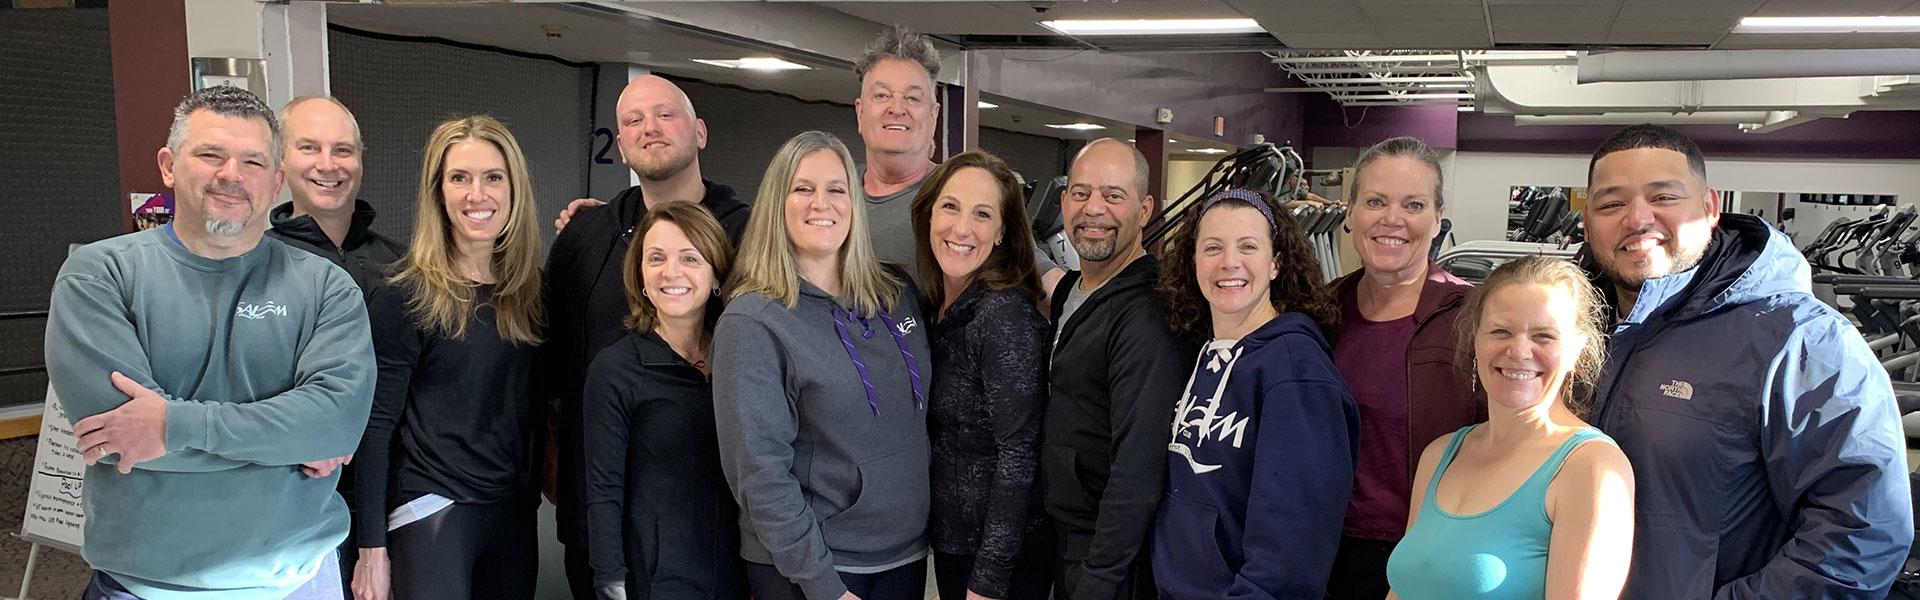 Meet the Salem Athletic Club staff